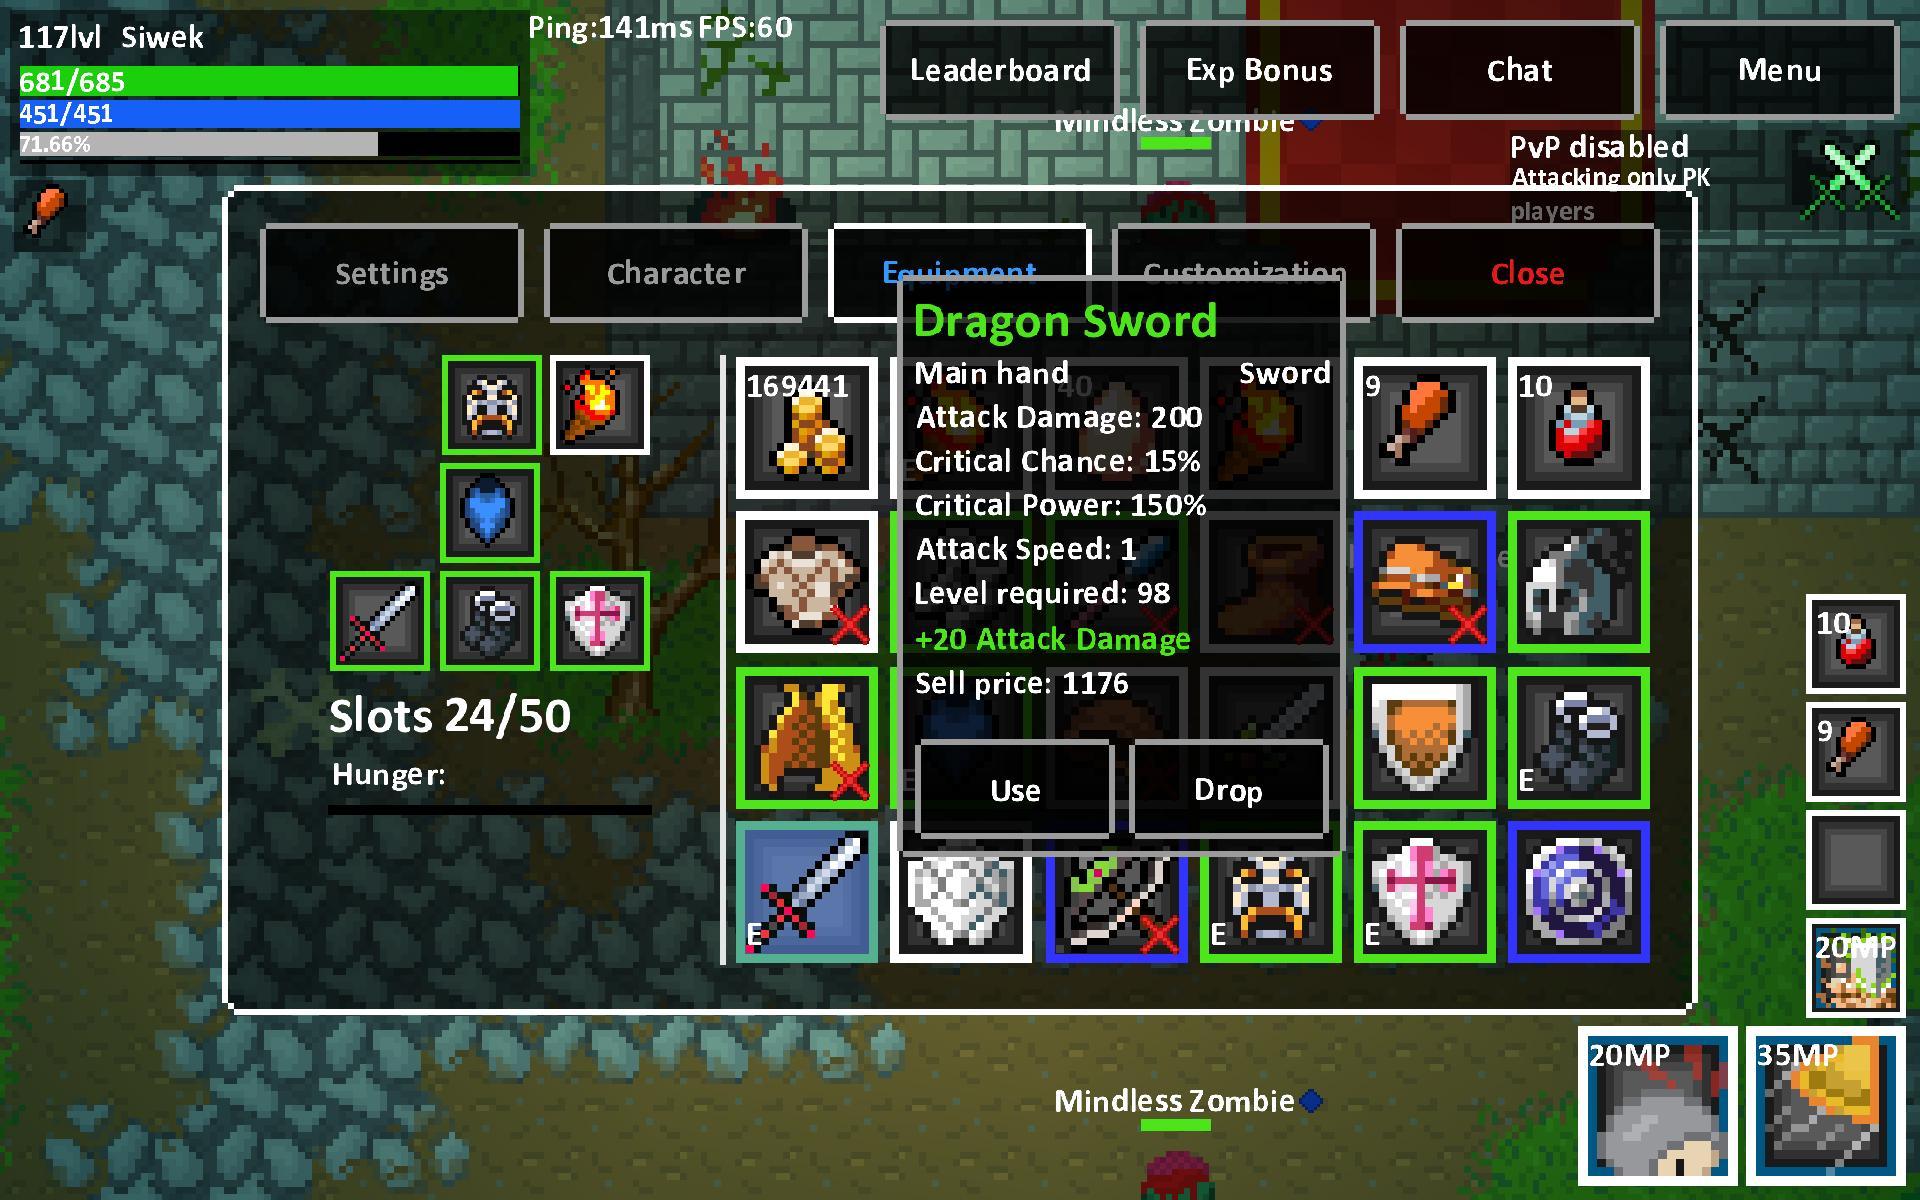 Heroes & Rats MMORPG Online 0.32.2 Screenshot 15